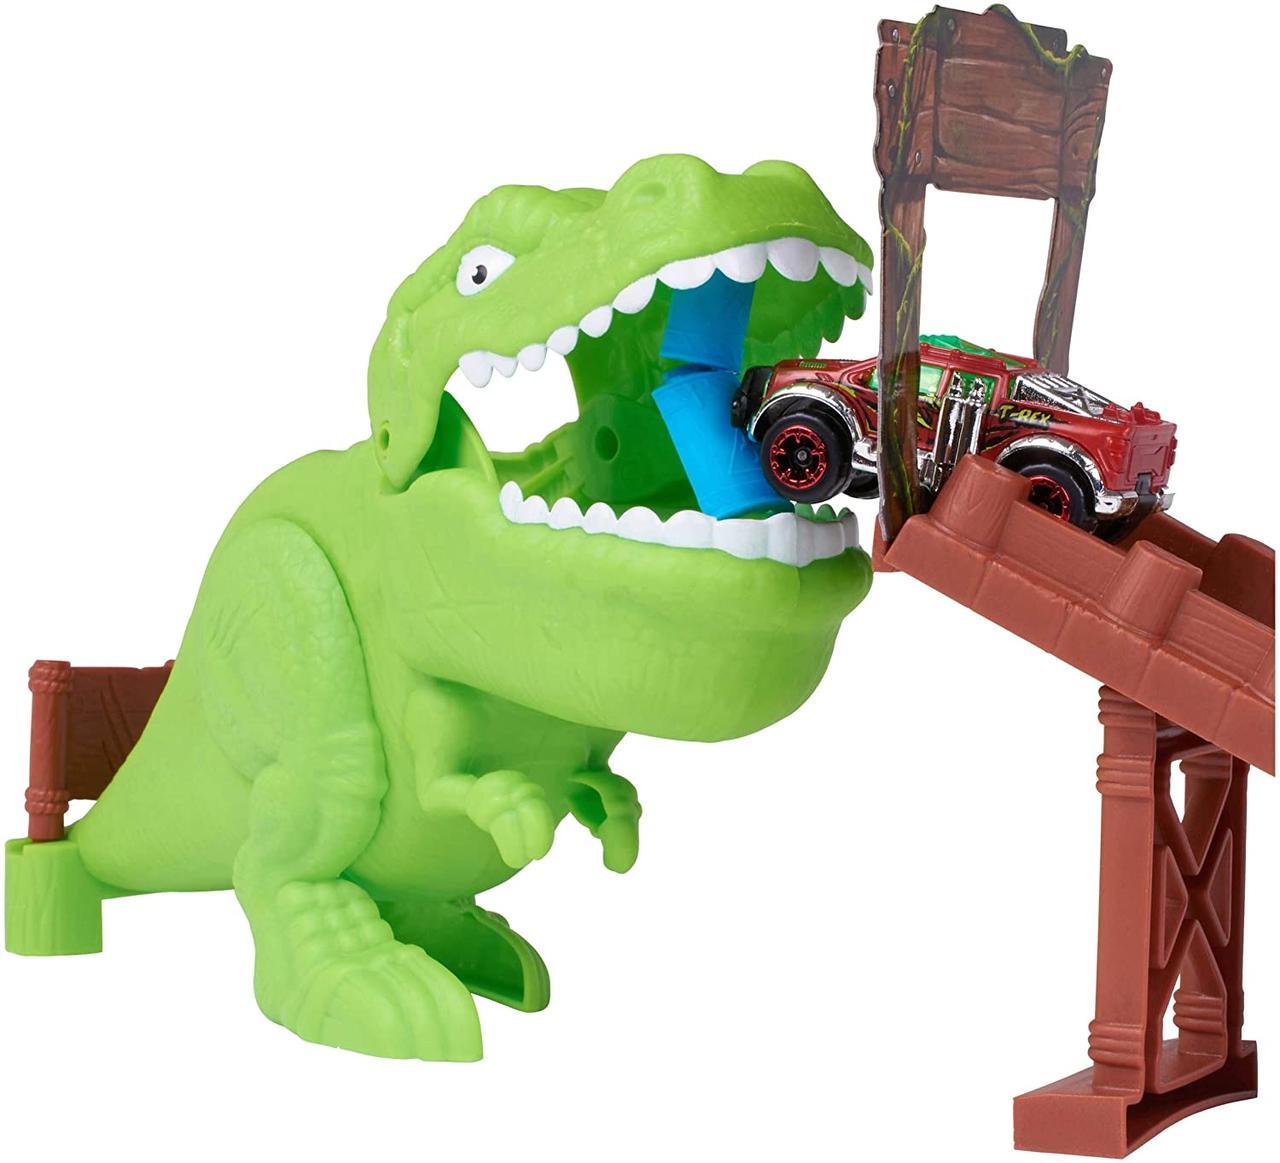 Трек Сила двойного кольца с динозавром T-Rex Adventure Force Double Loop Chomp and Crunch